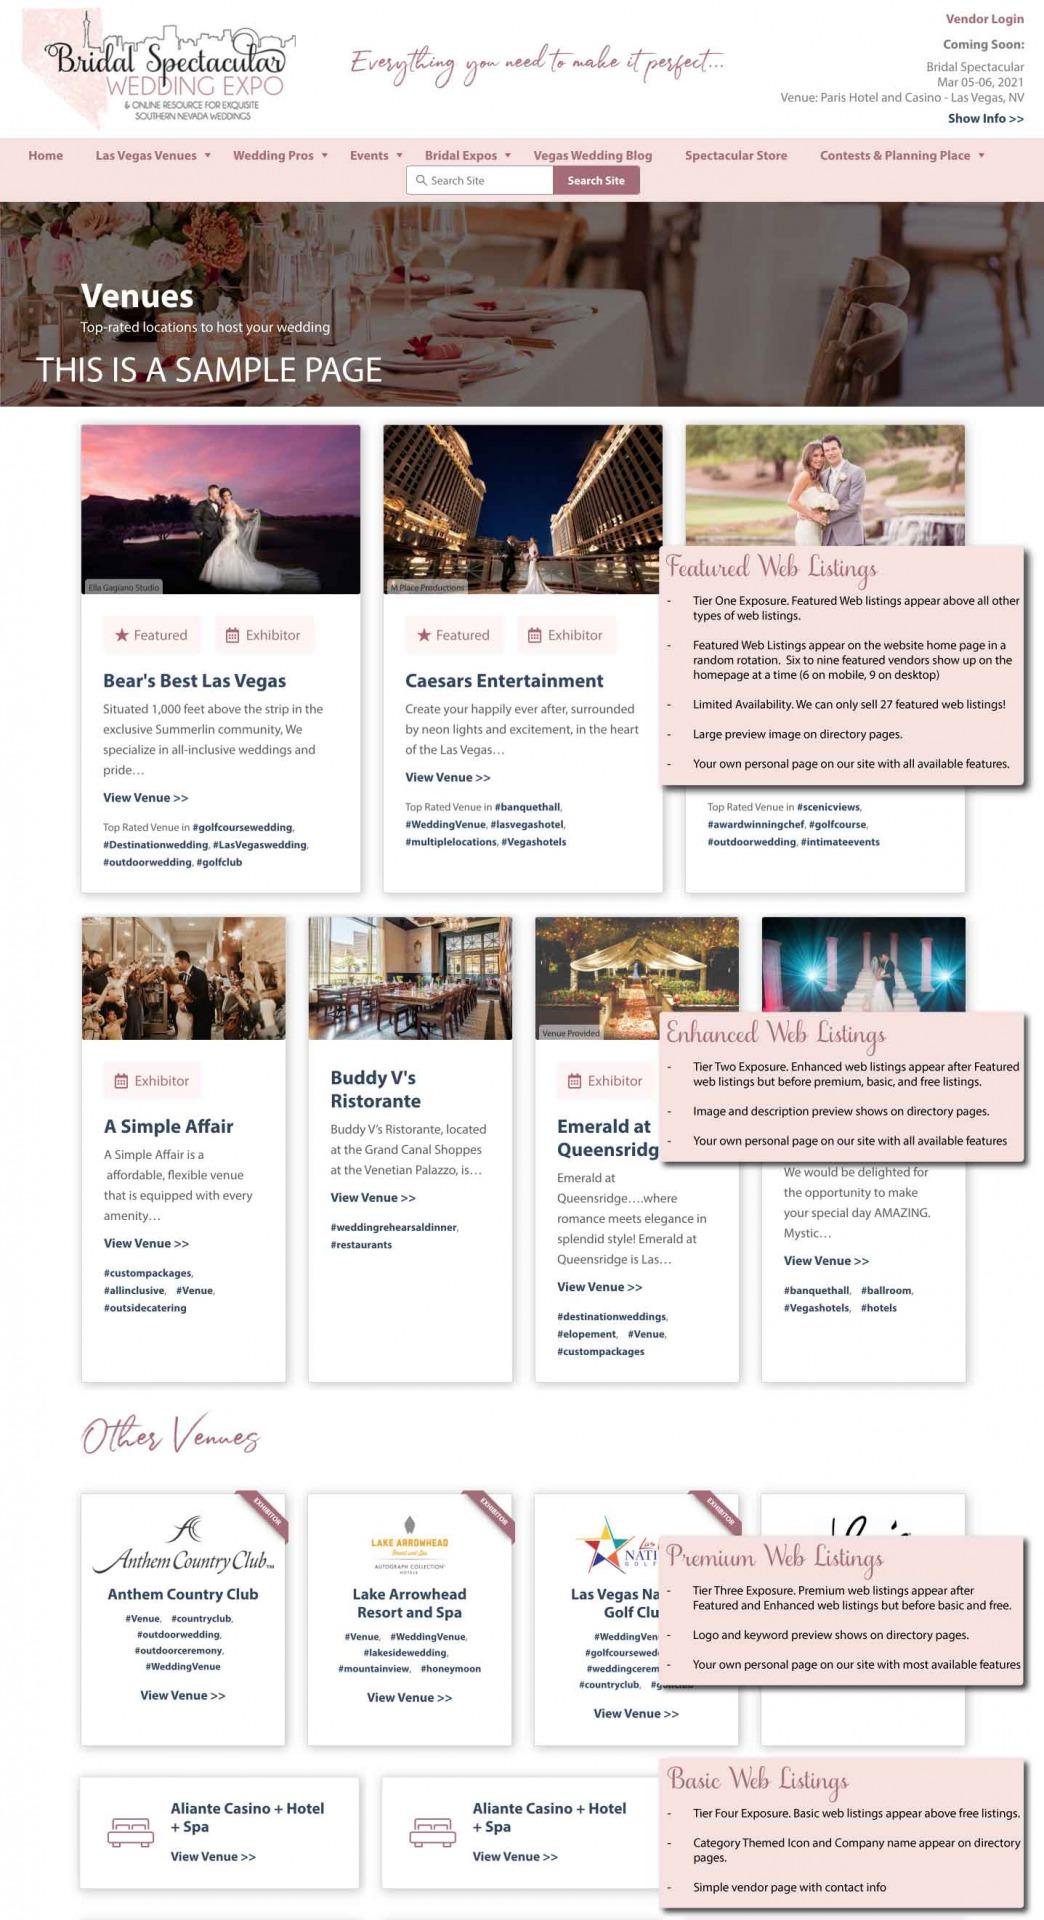 samples of web listings